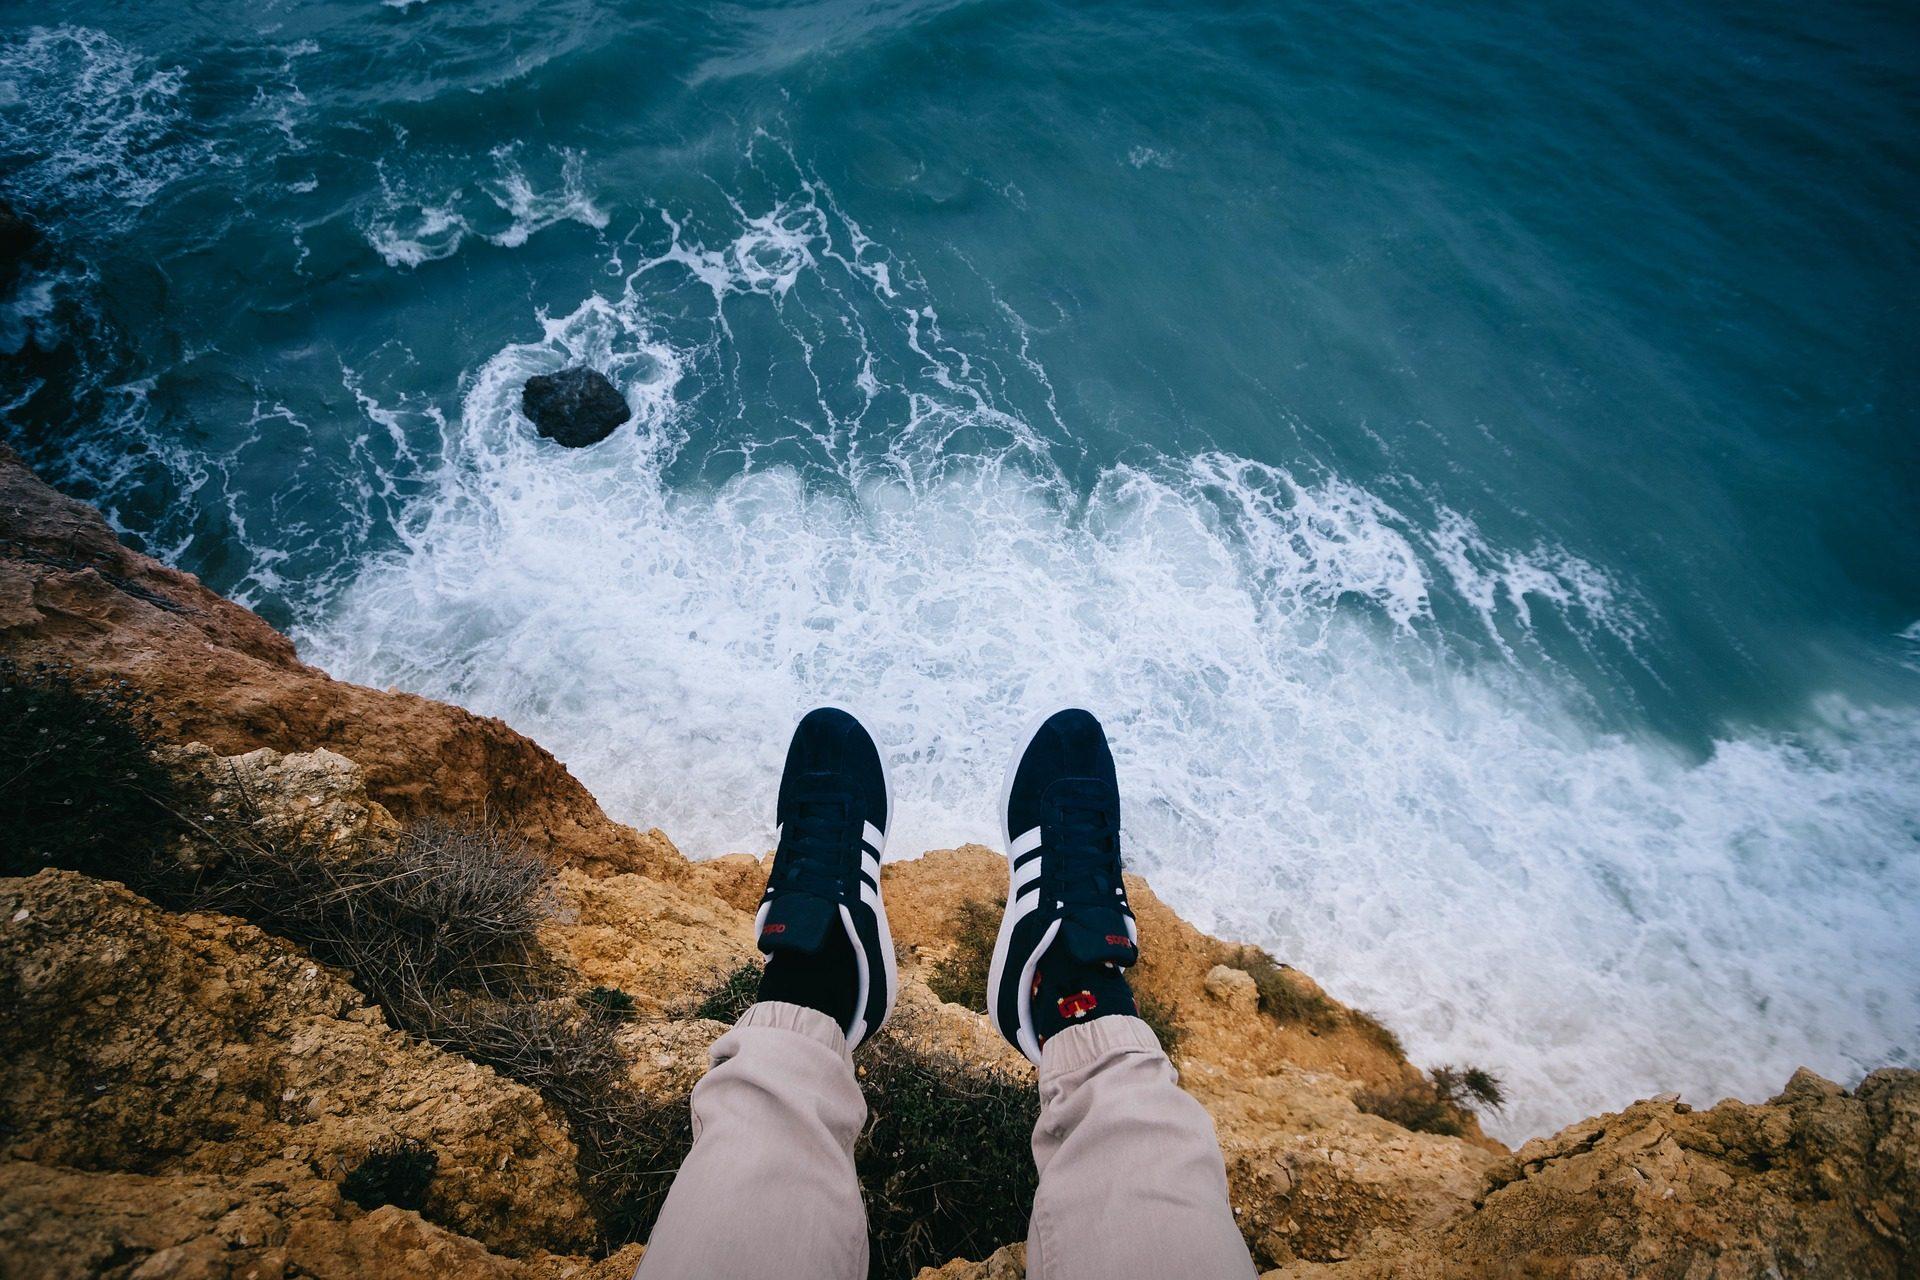 Mar, Cliff, pés, sapatos, ondas - Papéis de parede HD - Professor-falken.com